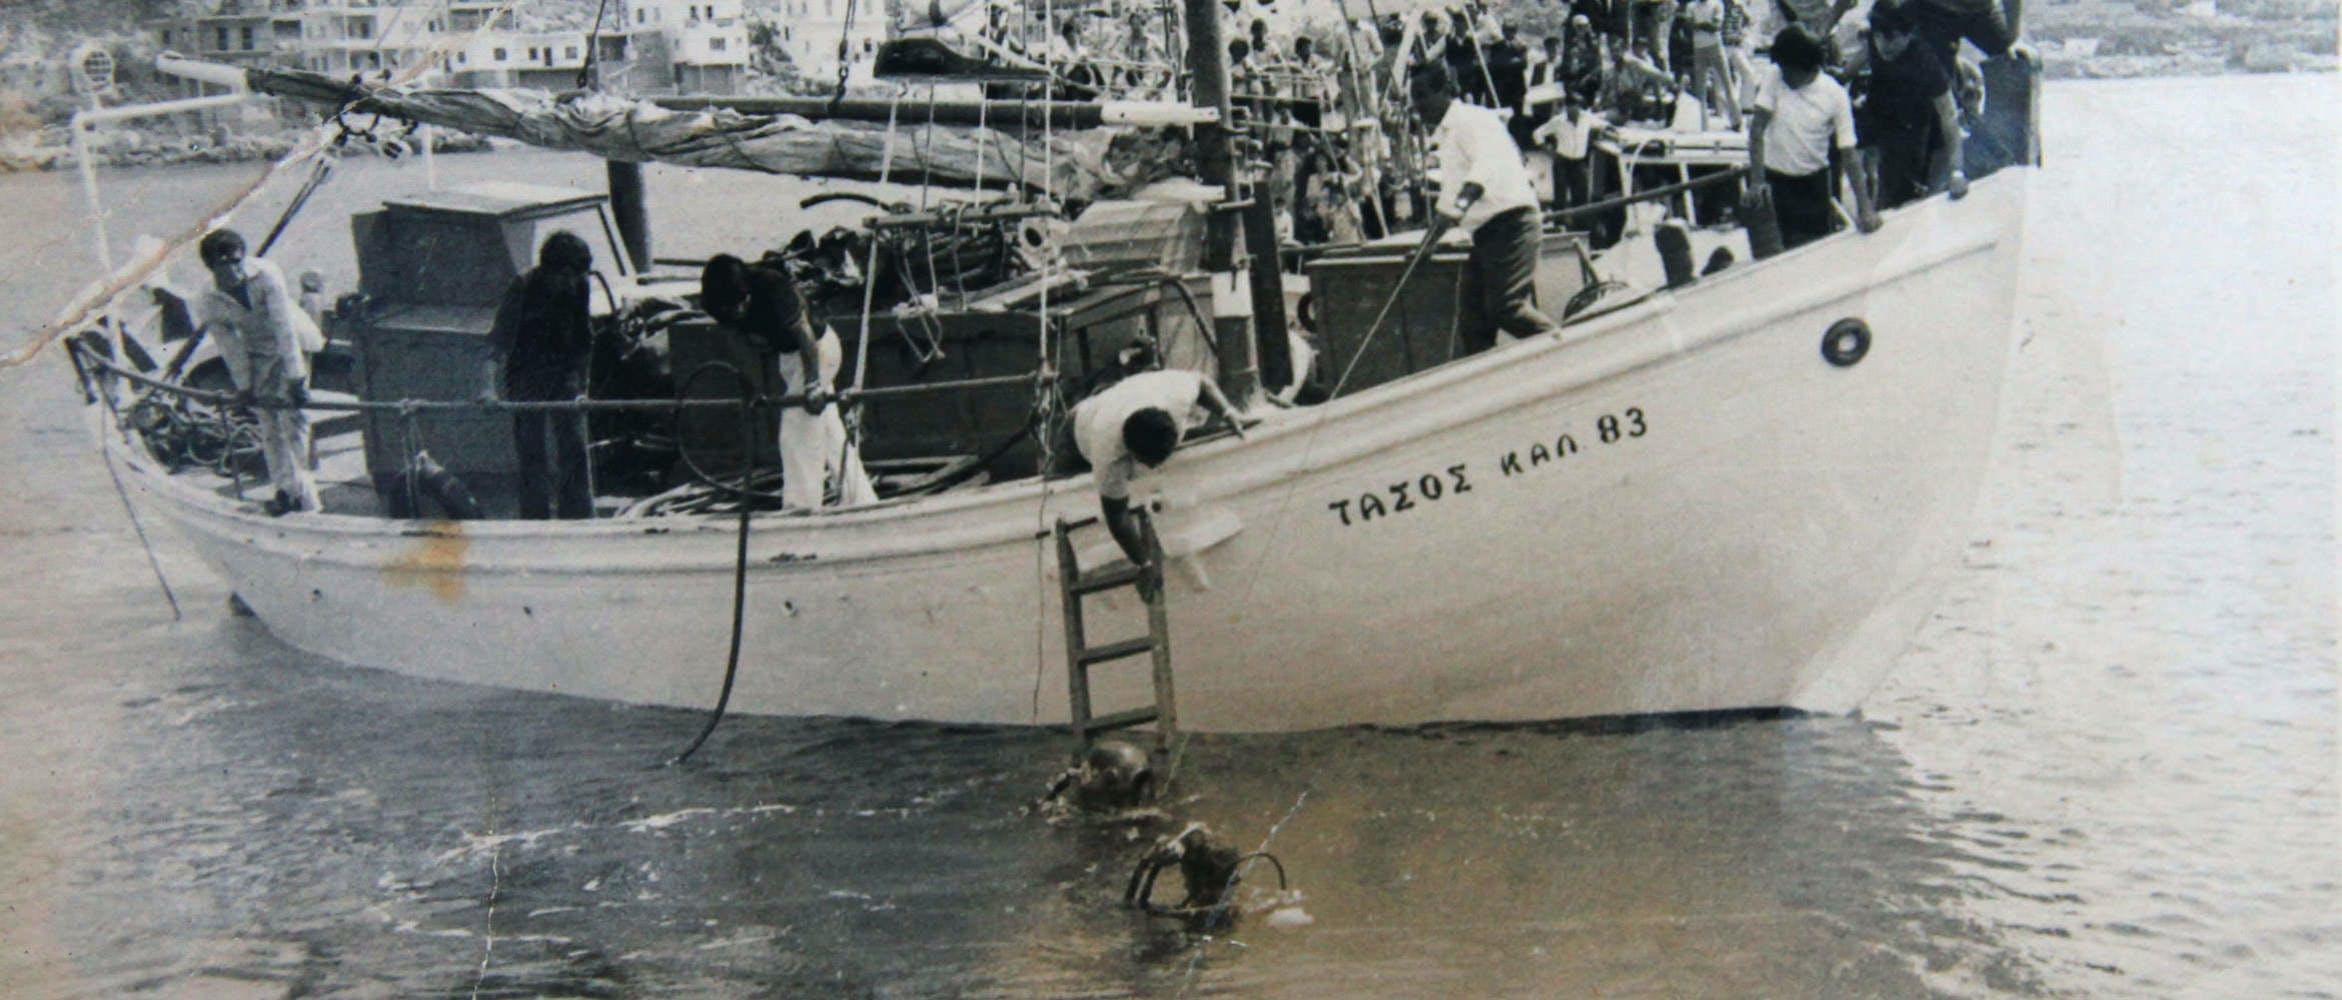 Featured 2x journal header sponge diving huckberry tonyworking1960s1.jpg?ixlib=rails 2.1